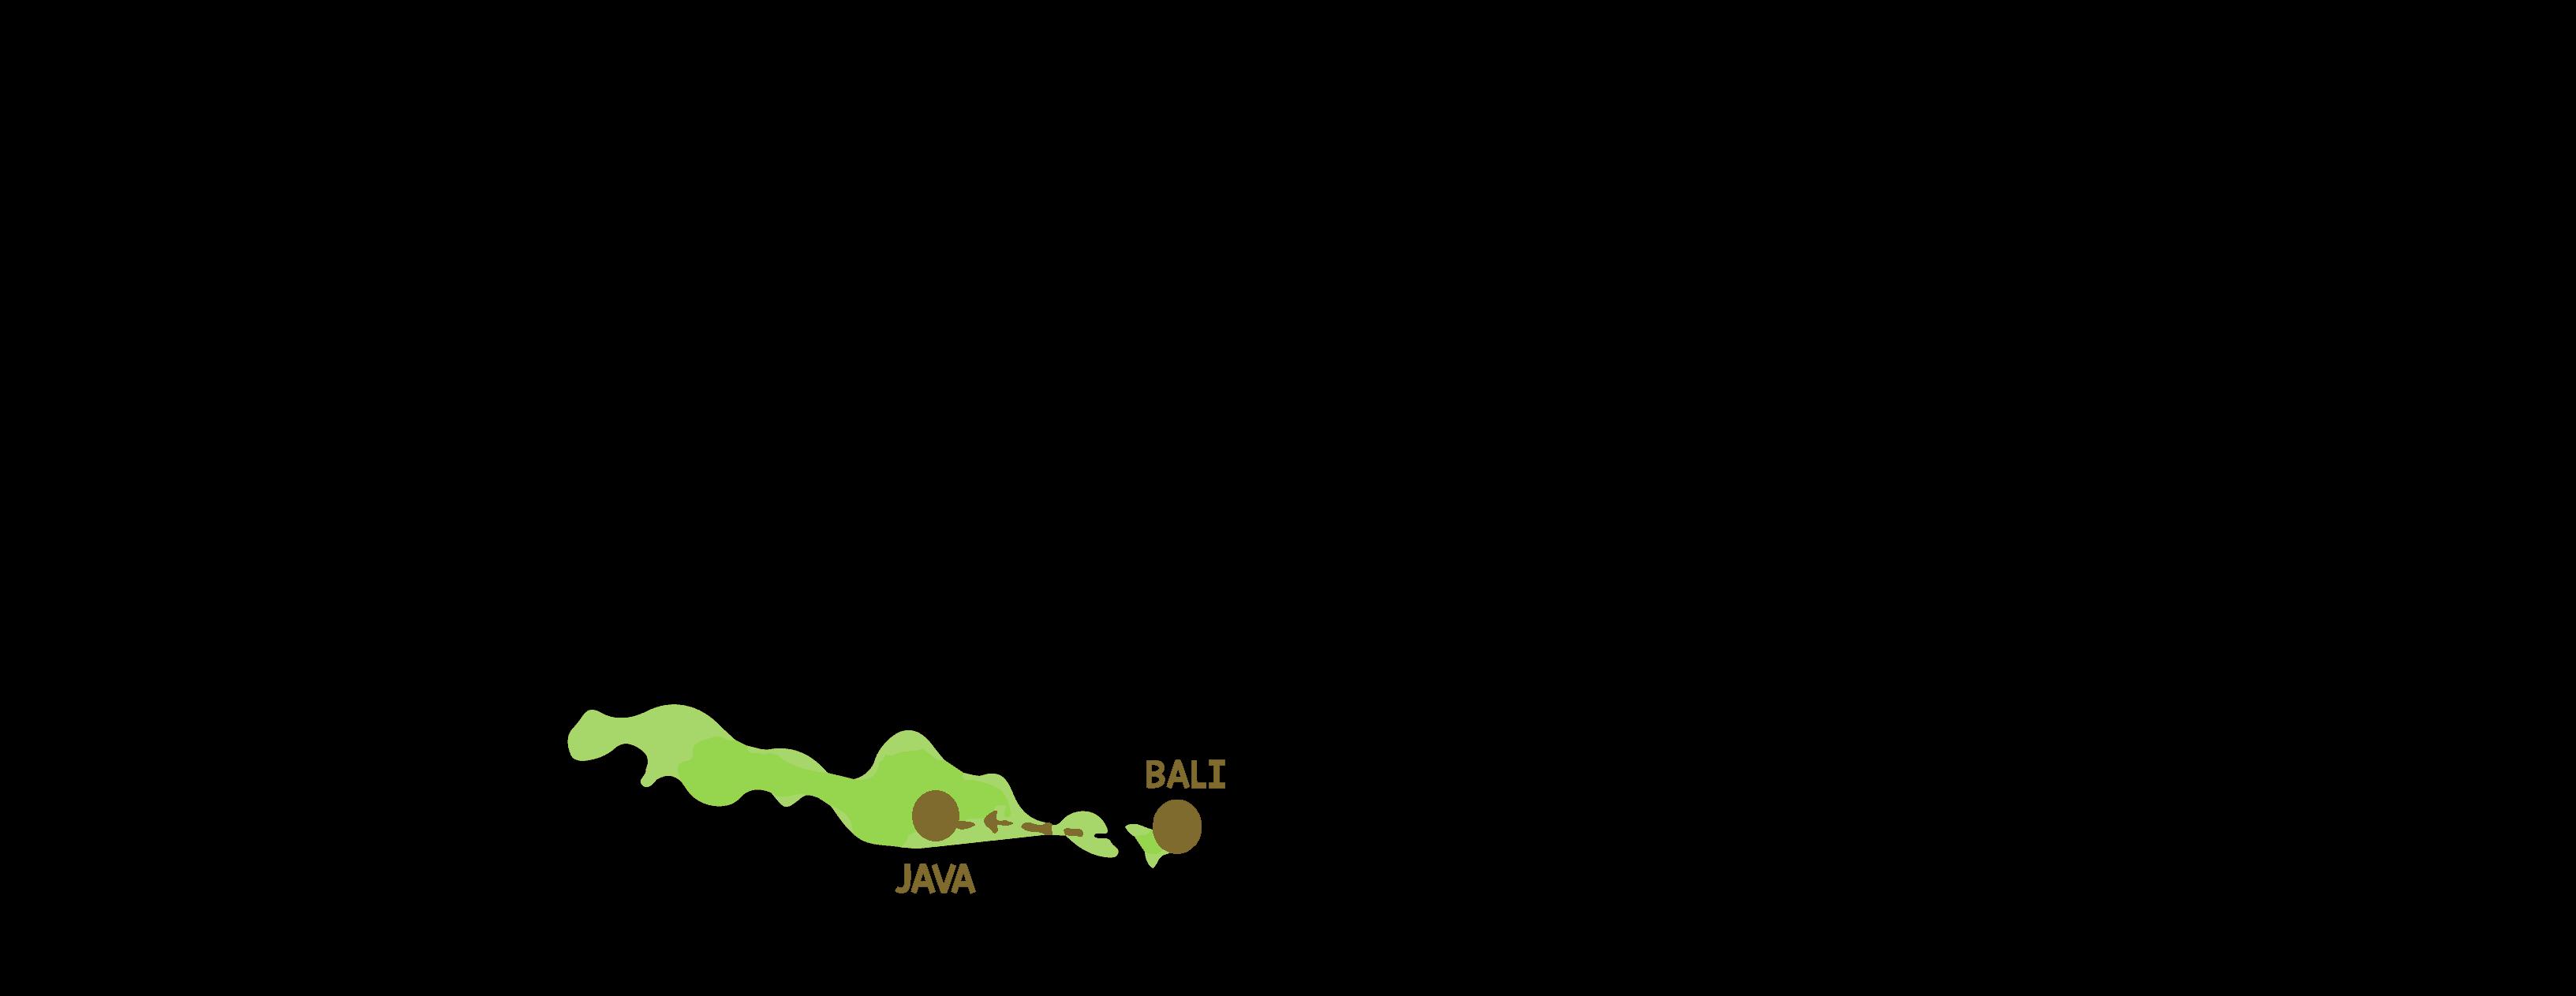 itinéraire voyage Indonésie Bali java